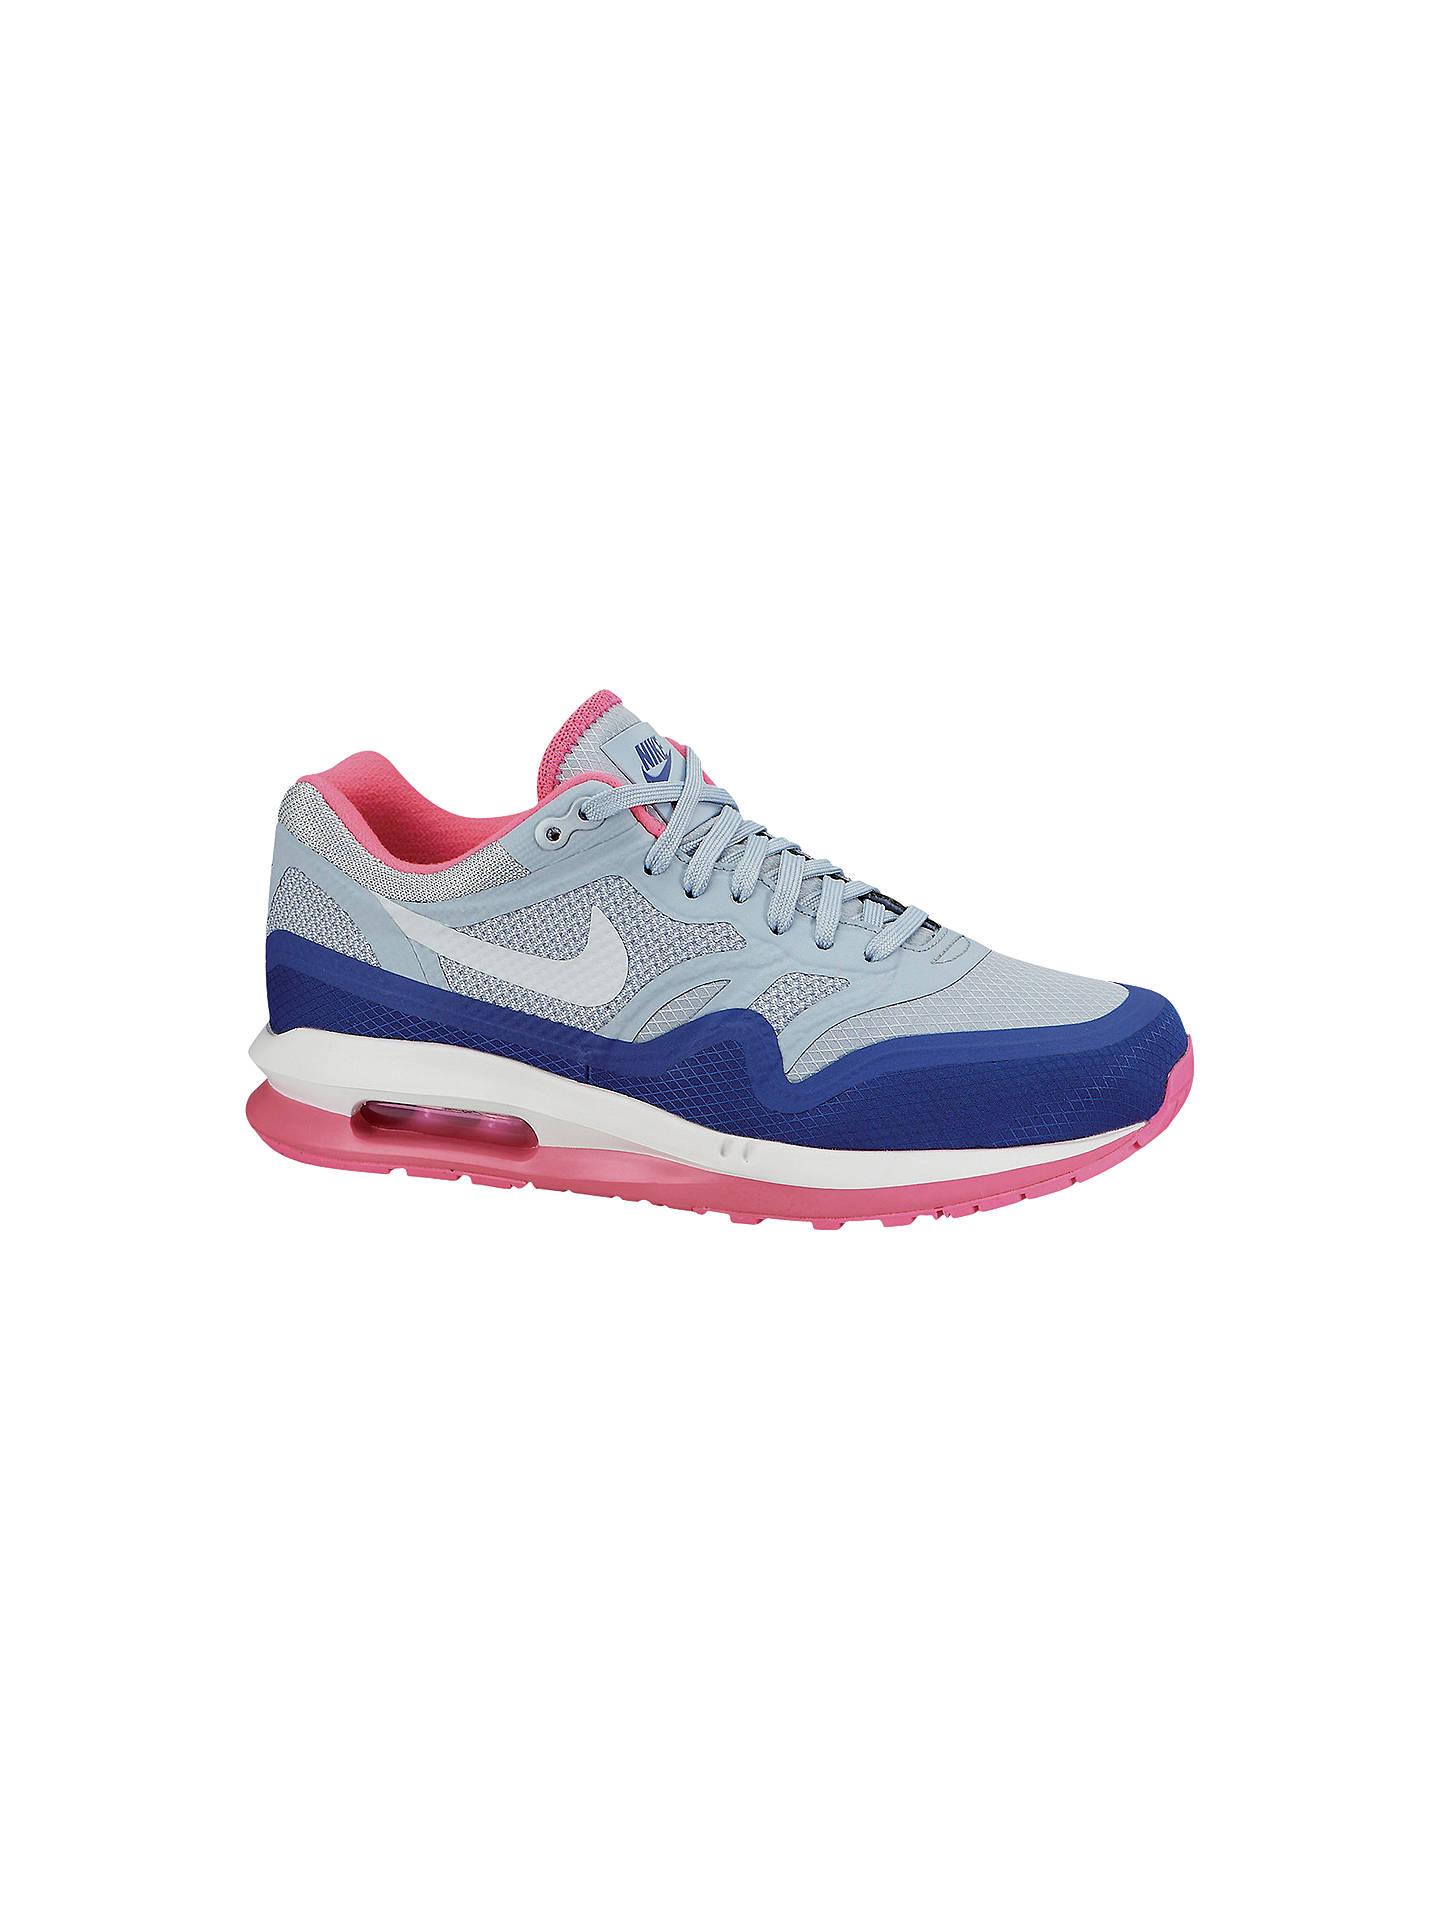 best website 2697b 80b55 Buy Nike Women s Air Max Lunar1 Trainers, Light Magnet Grey Hyper Pink, 3